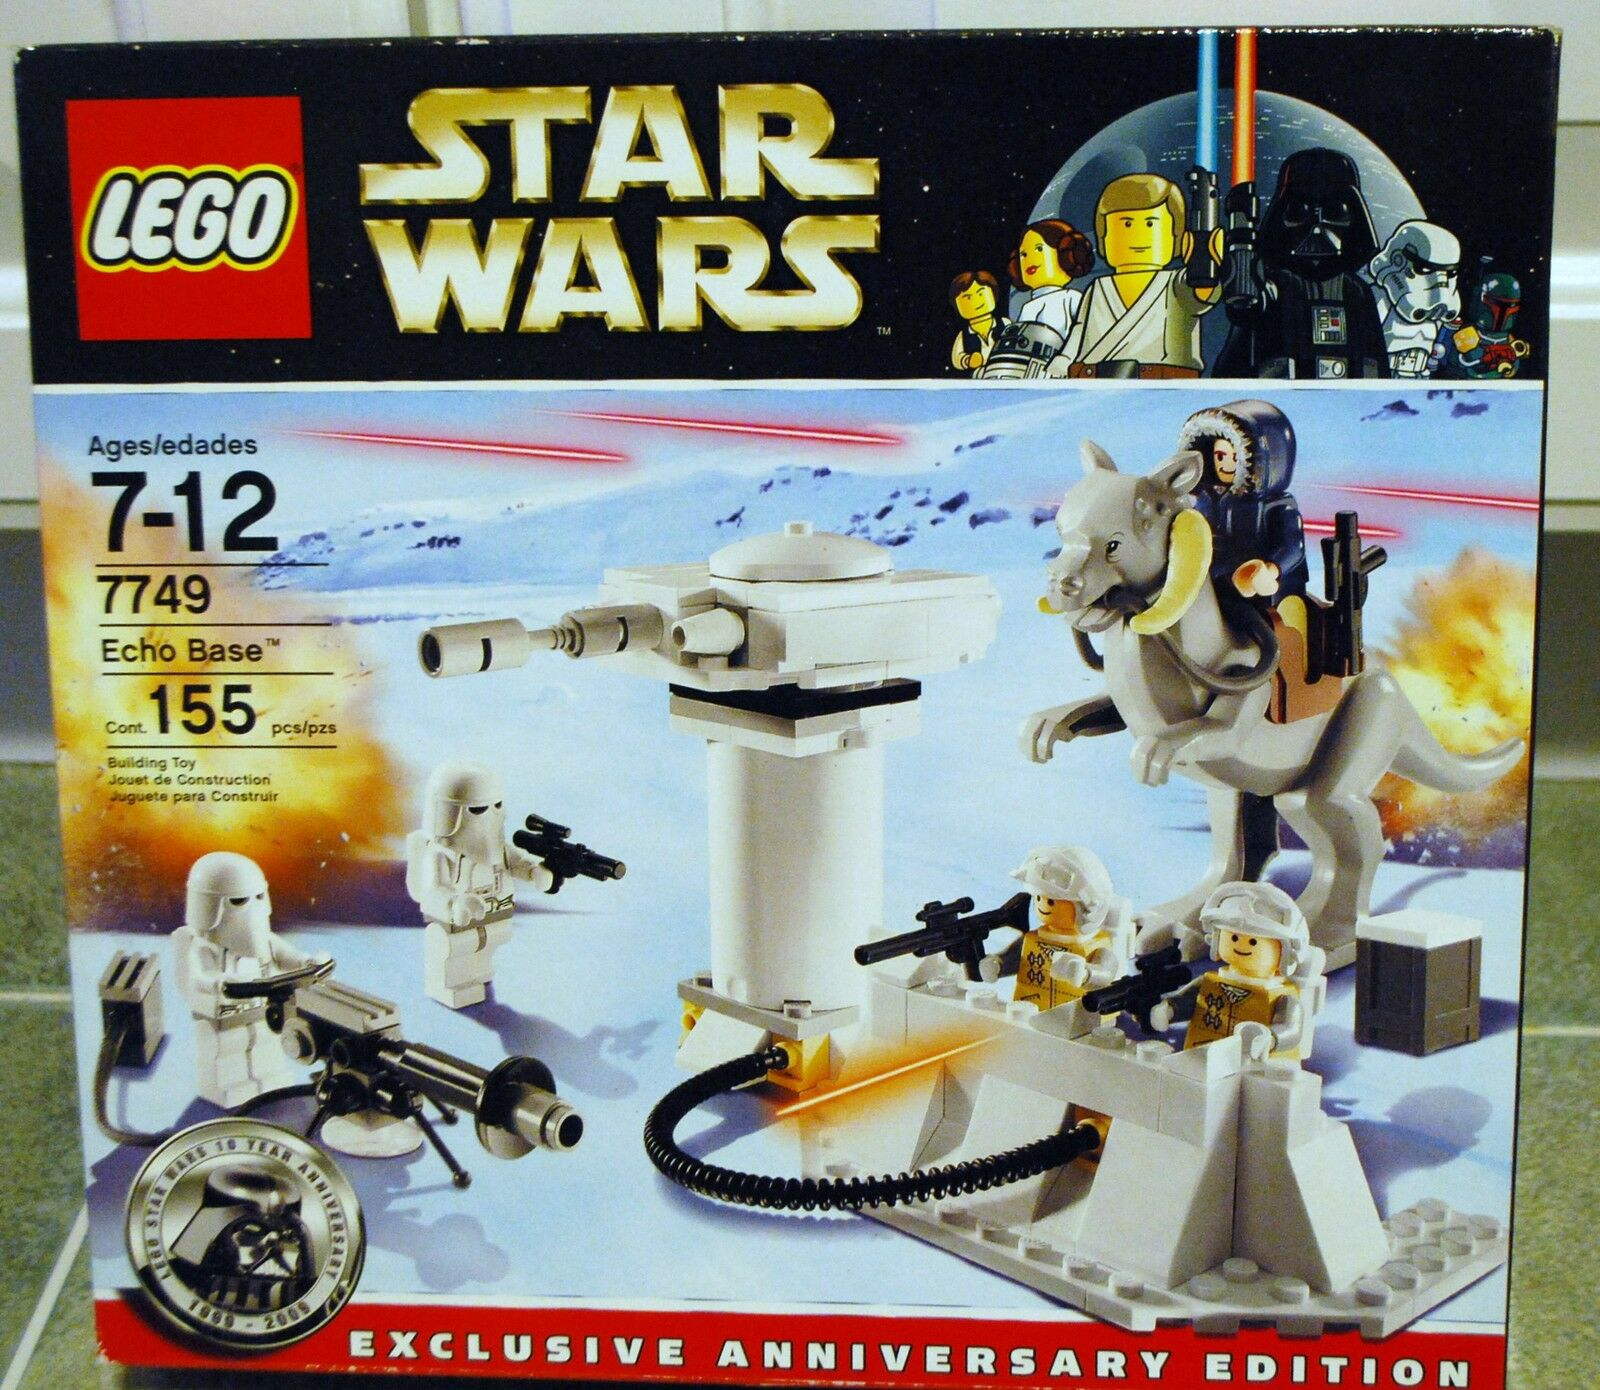 LEGO LEGO LEGO Star Wars Anniversary Edition ECHO BASE New in Box  8de47e